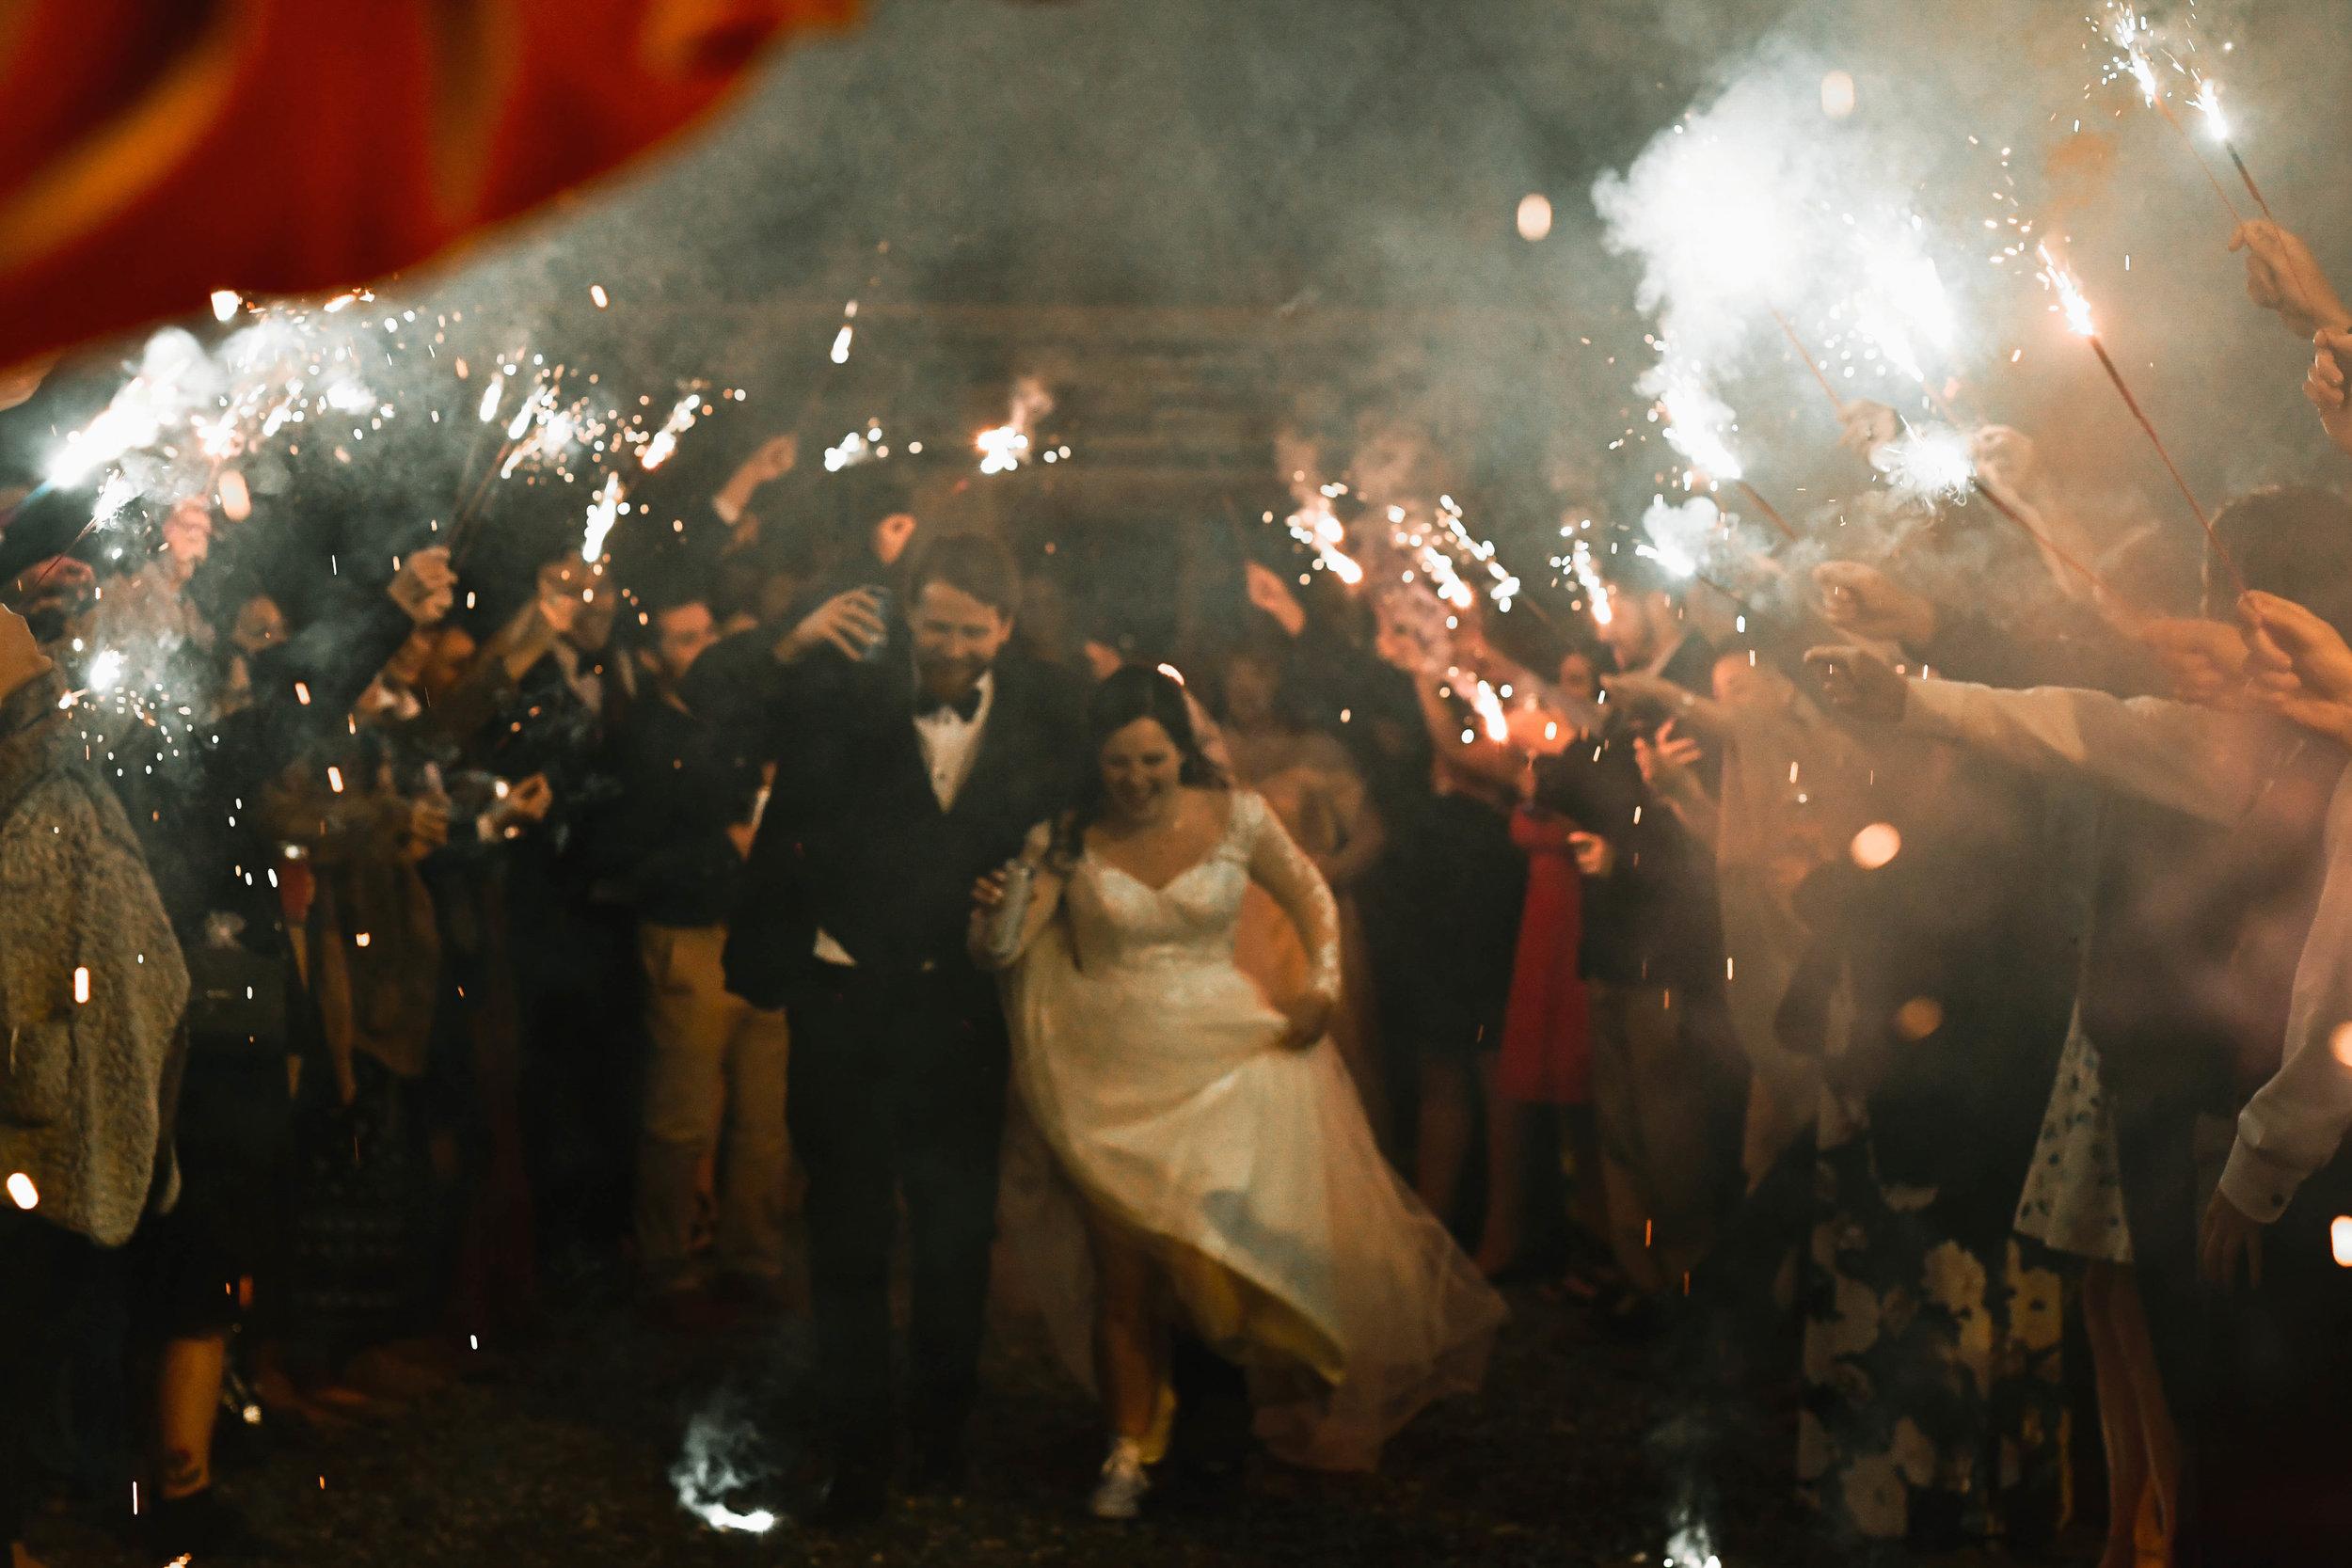 Mr. & Mrs. Konrad - WEDDING AT THE LONGHOUSE